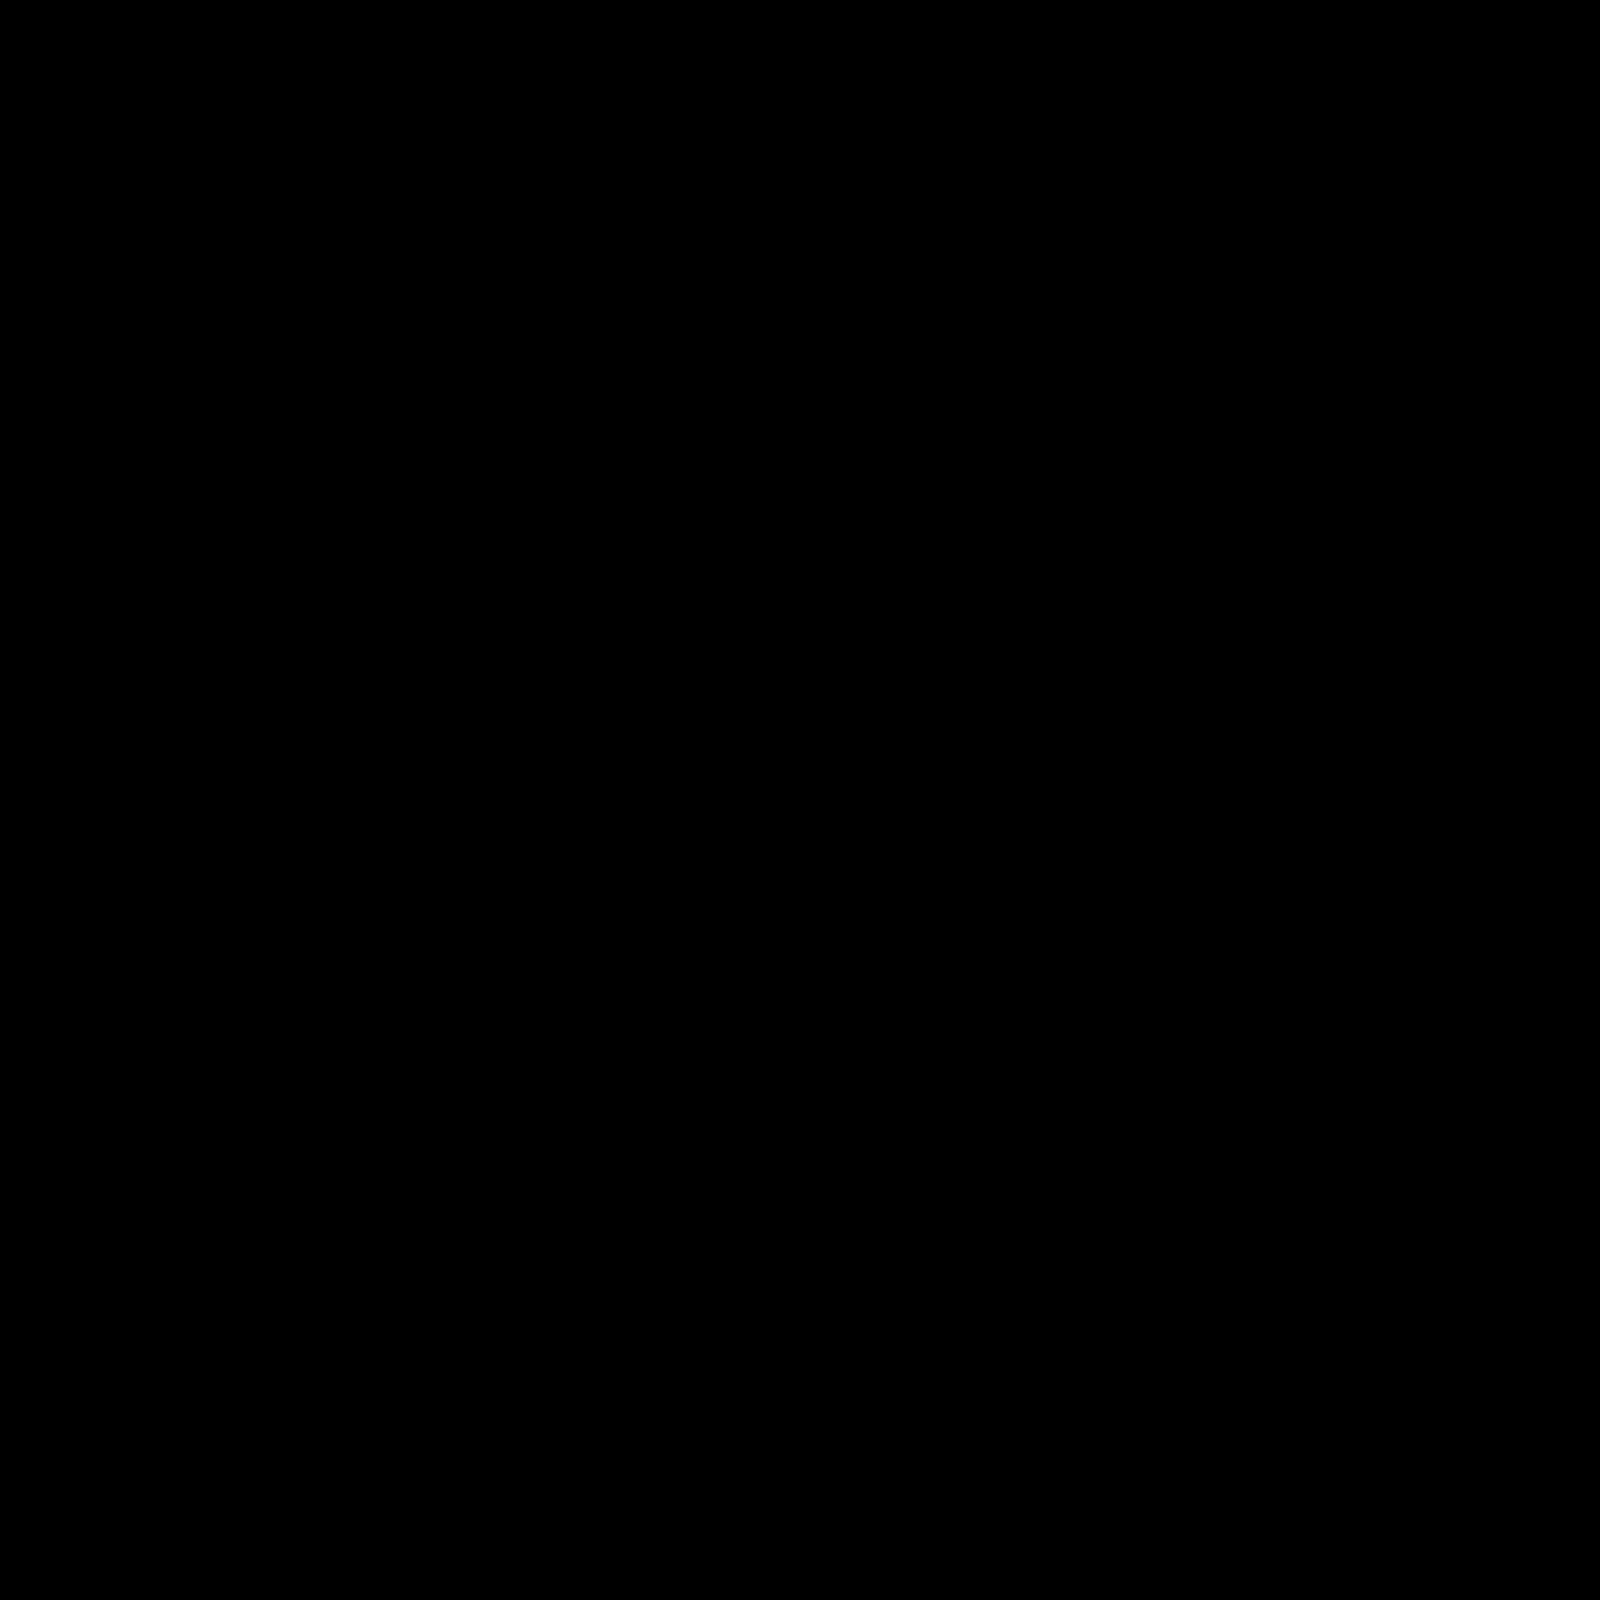 Energy meter icon free. Clipart ruler metre ruler